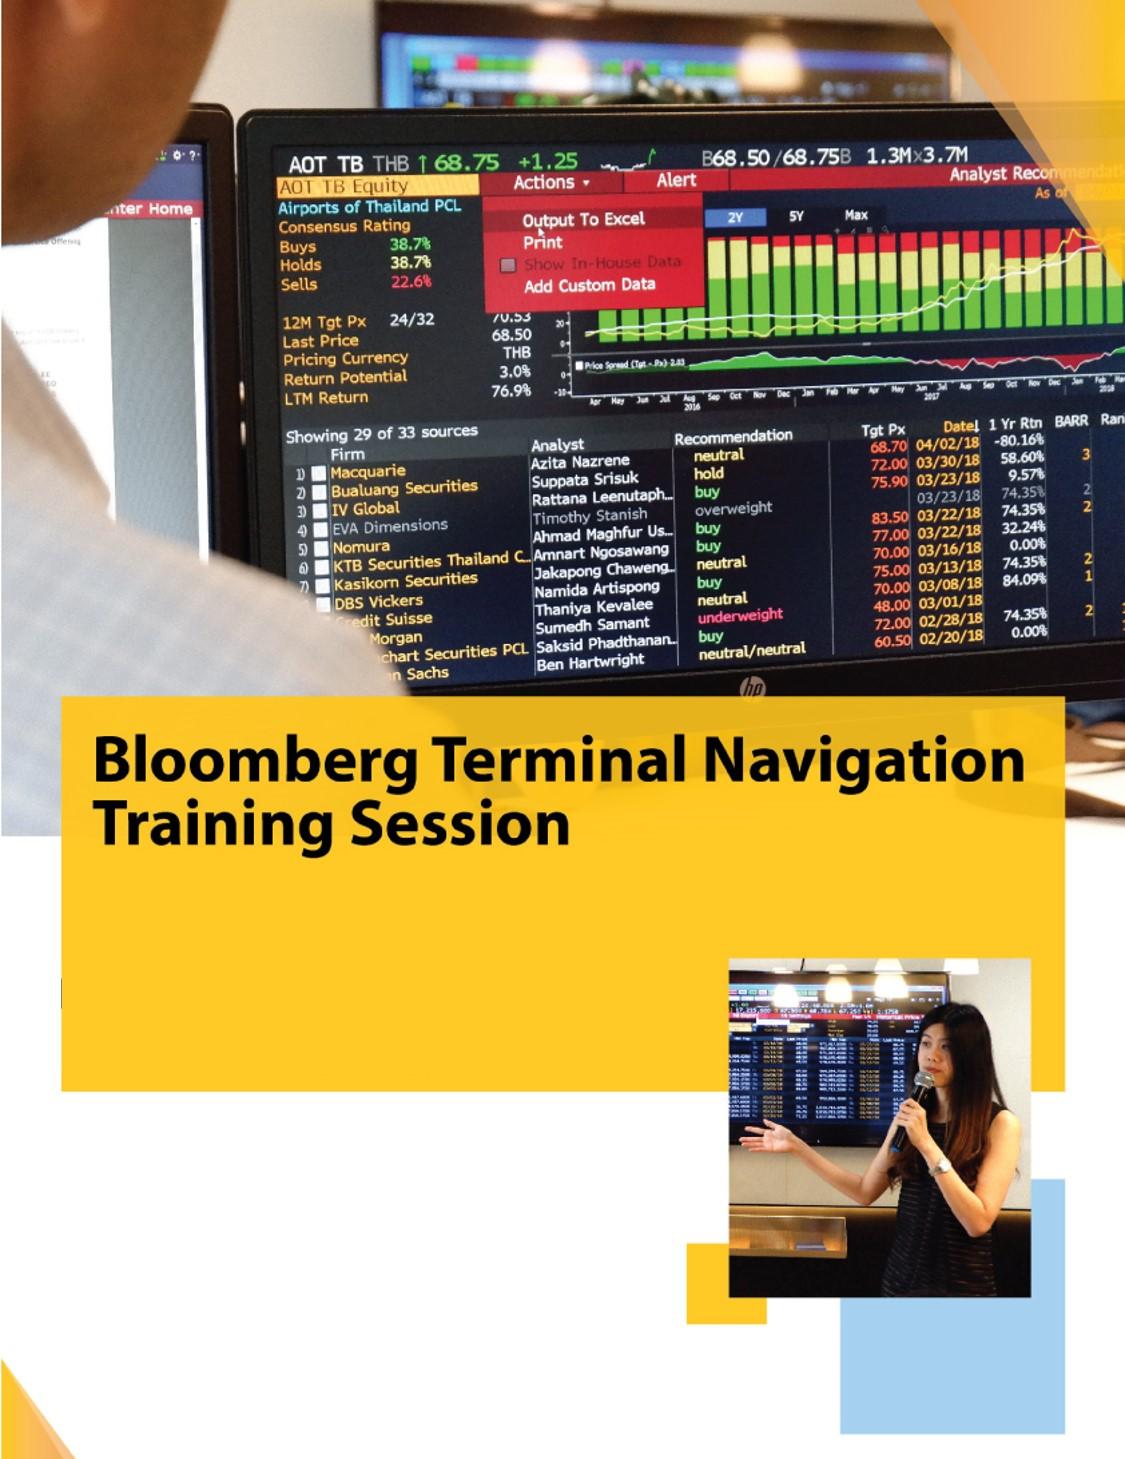 Bloomberg Terminal Navigation Training Session Stamford